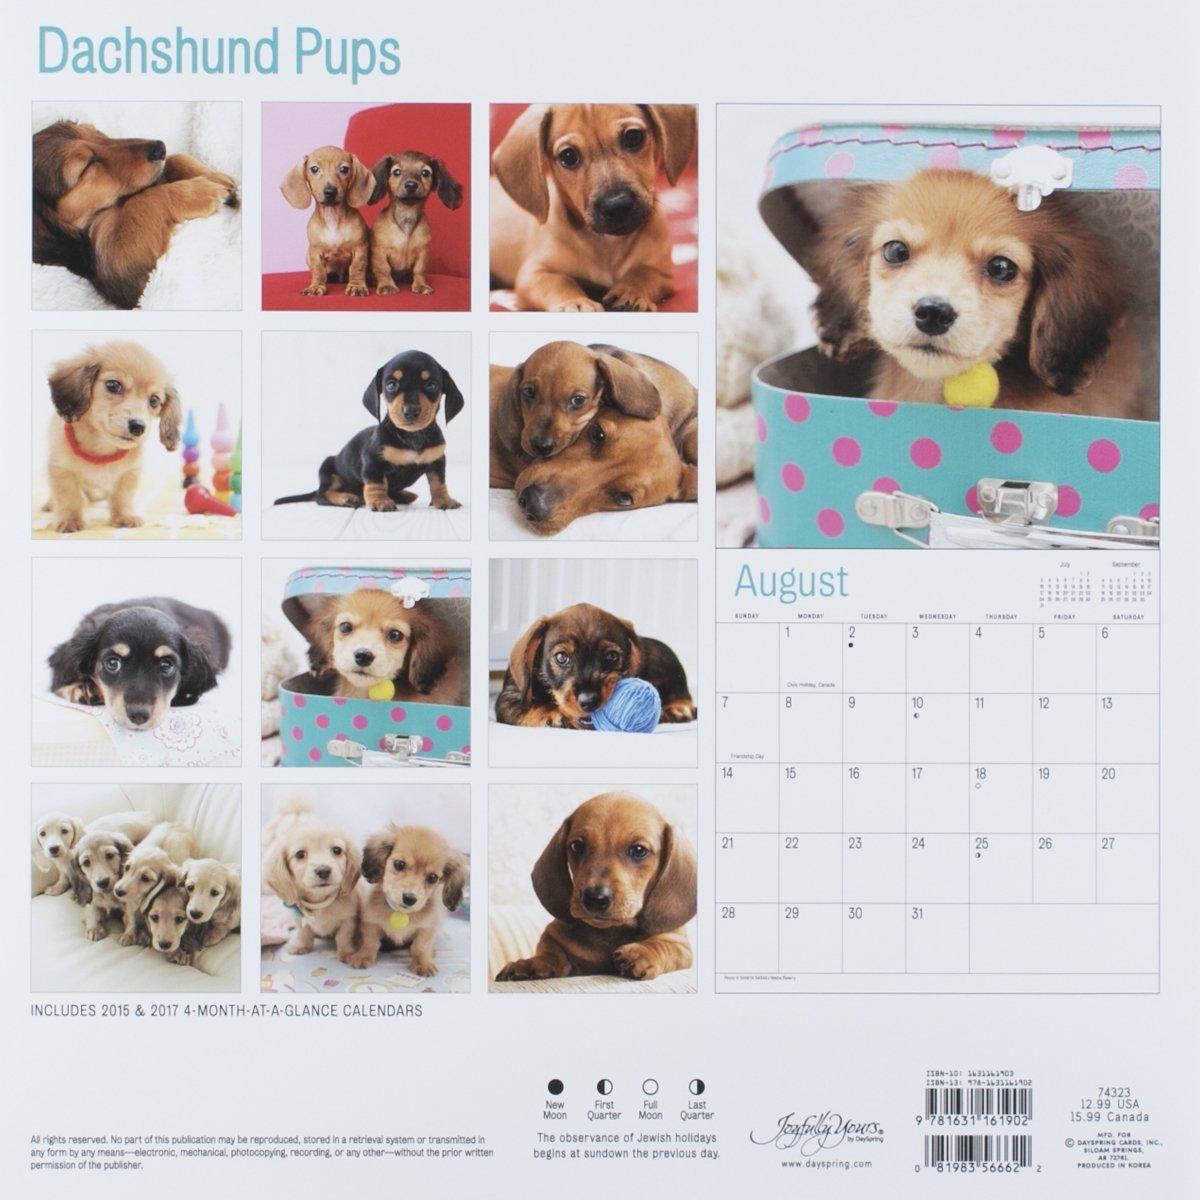 Dachshund @ DogBreed-Gifts.com - Dachshund Calendars